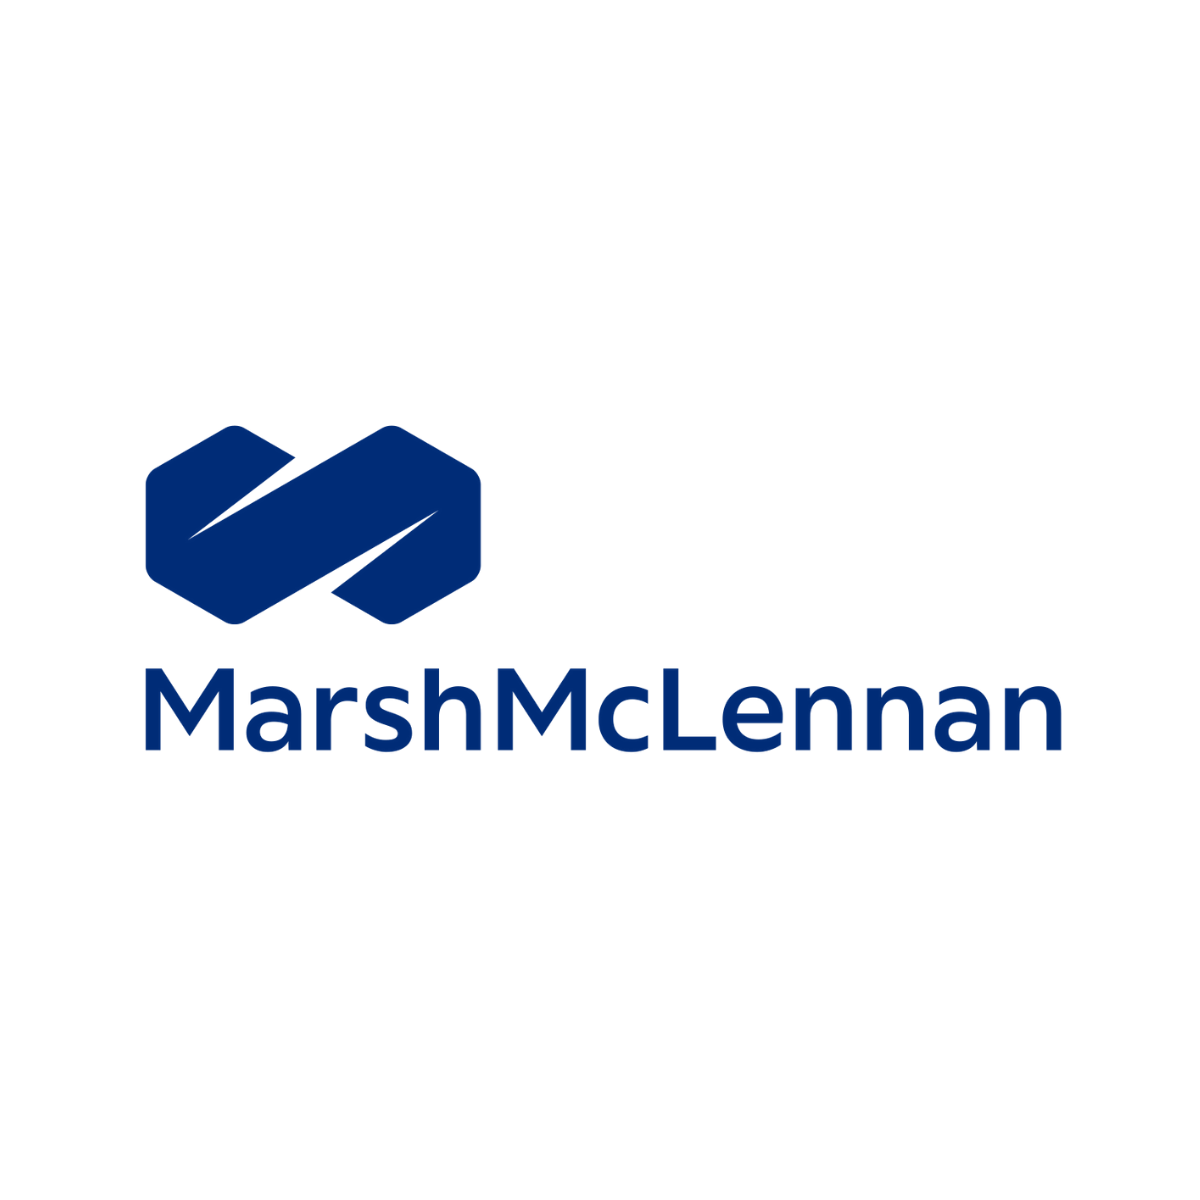 Marsh McLennan